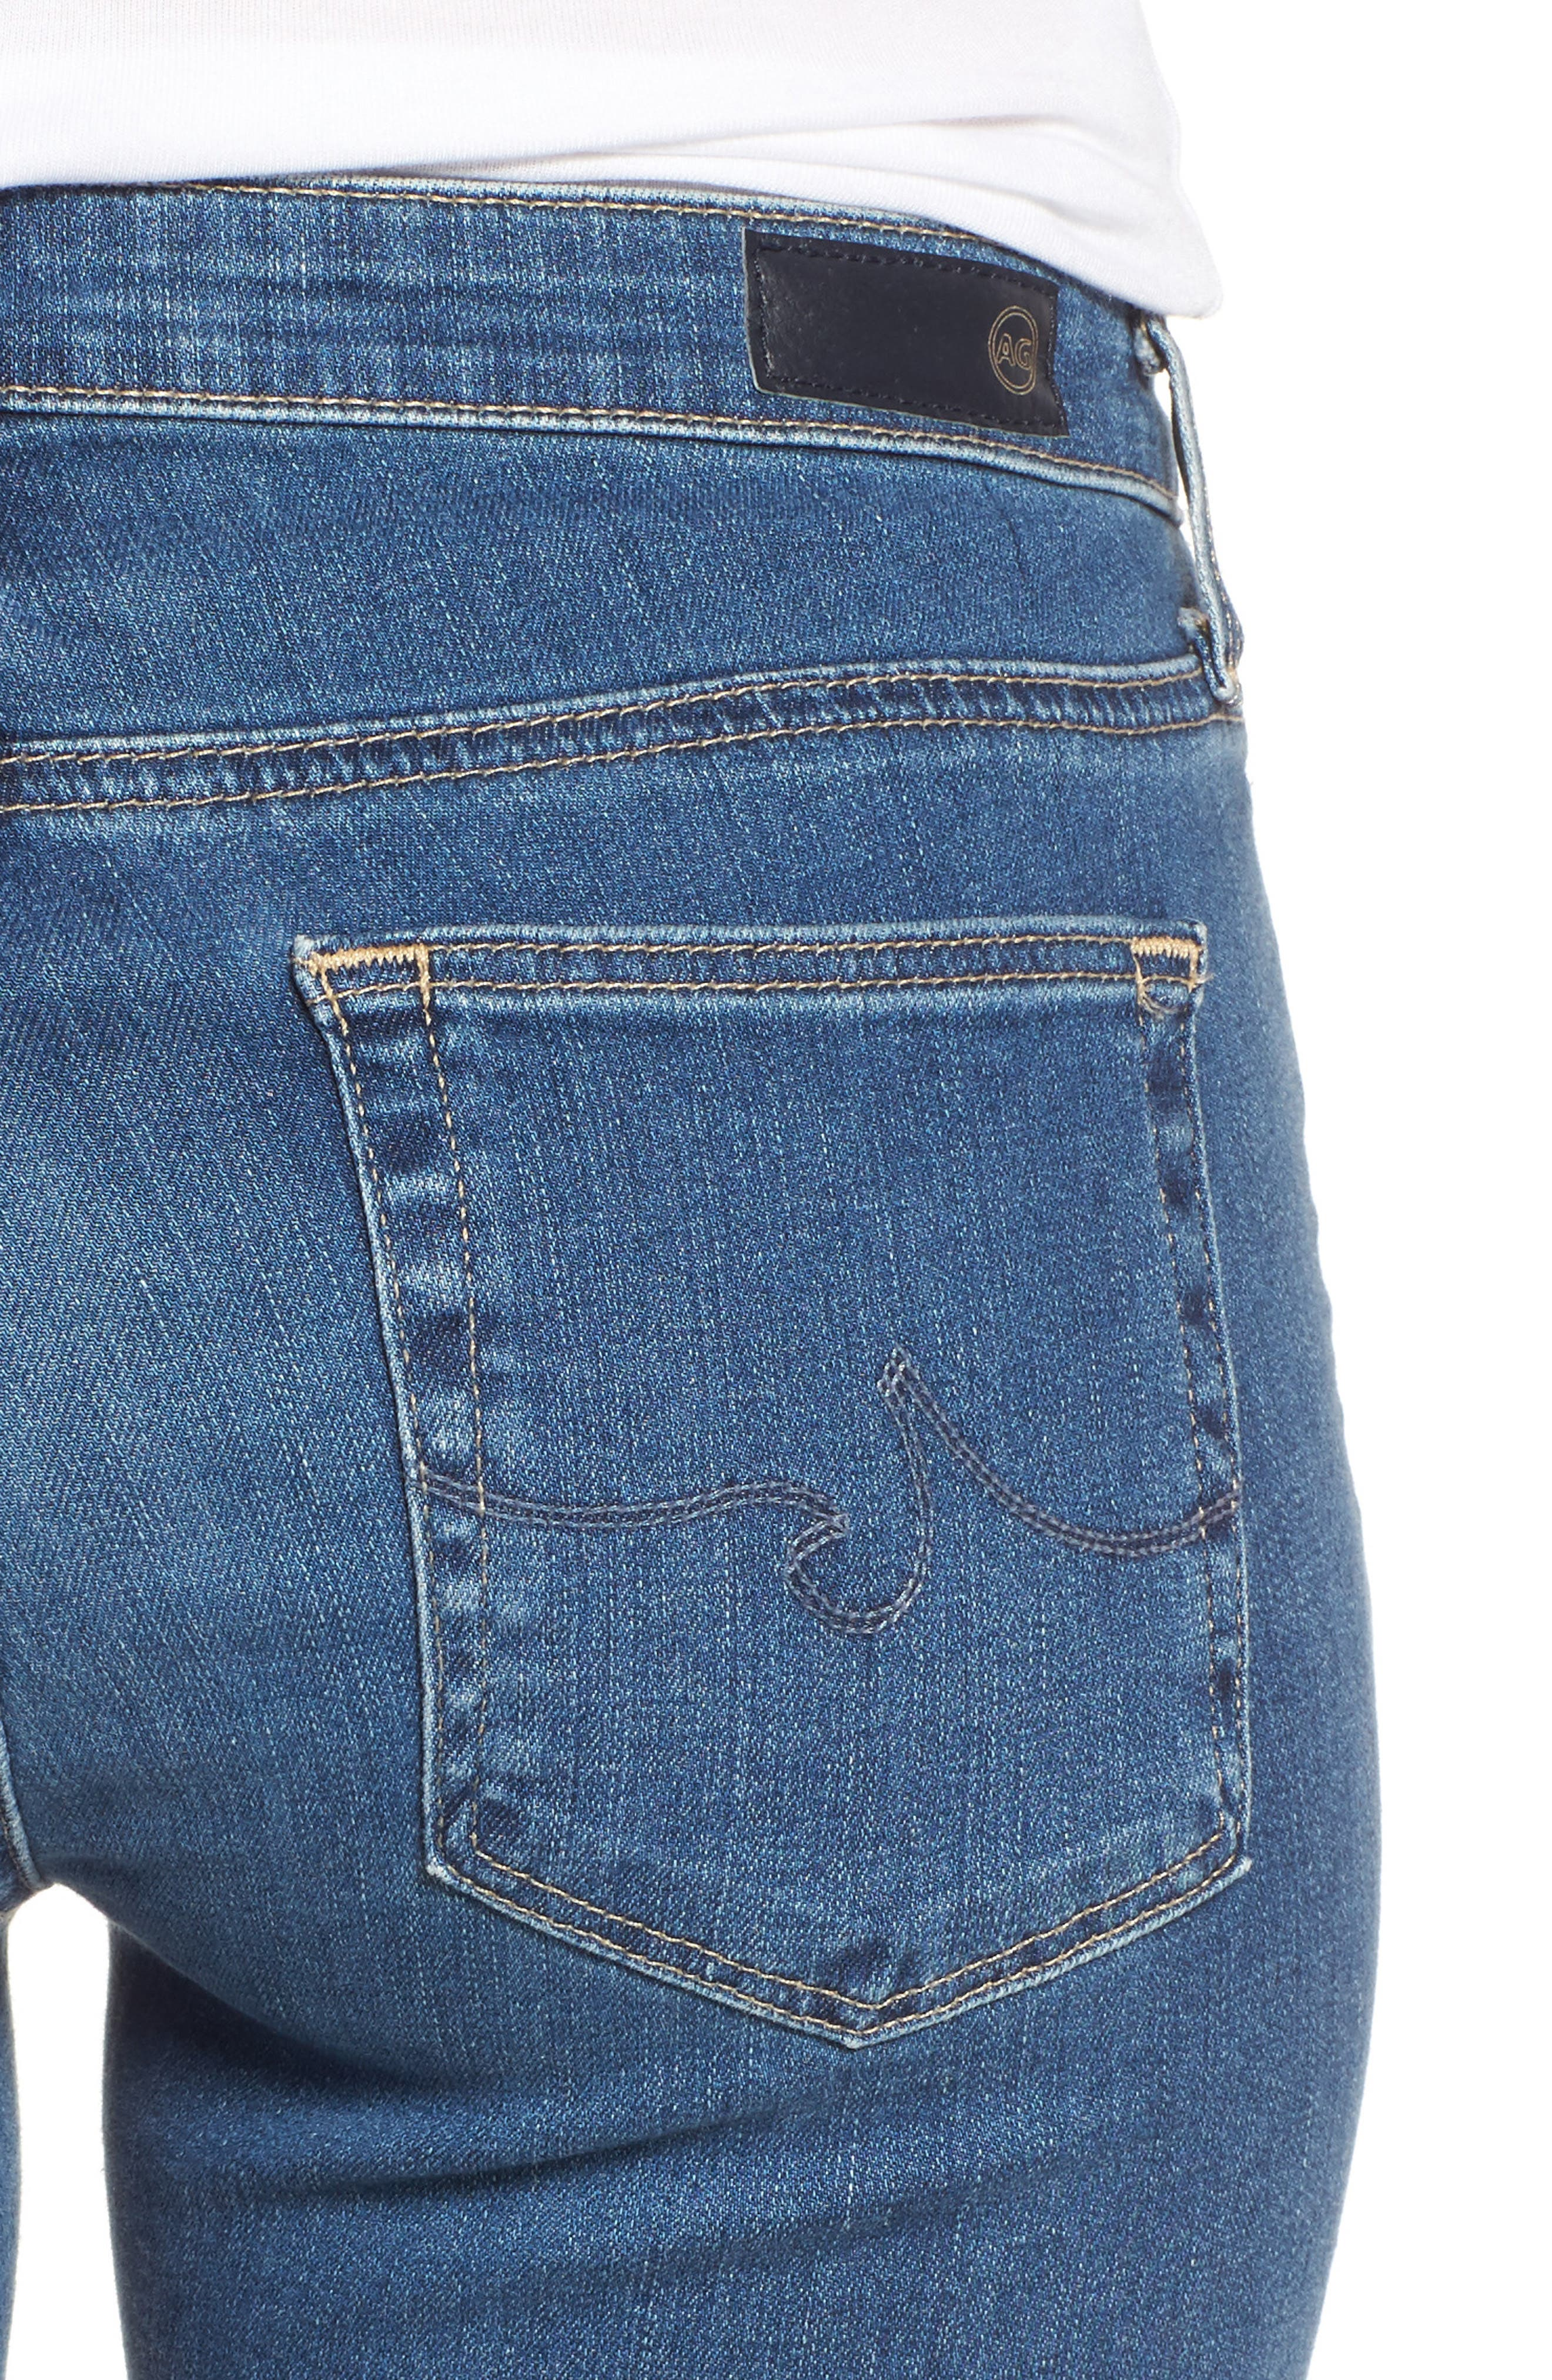 Prima Crop Skinny Jeans,                             Alternate thumbnail 4, color,                             Indigo Viking